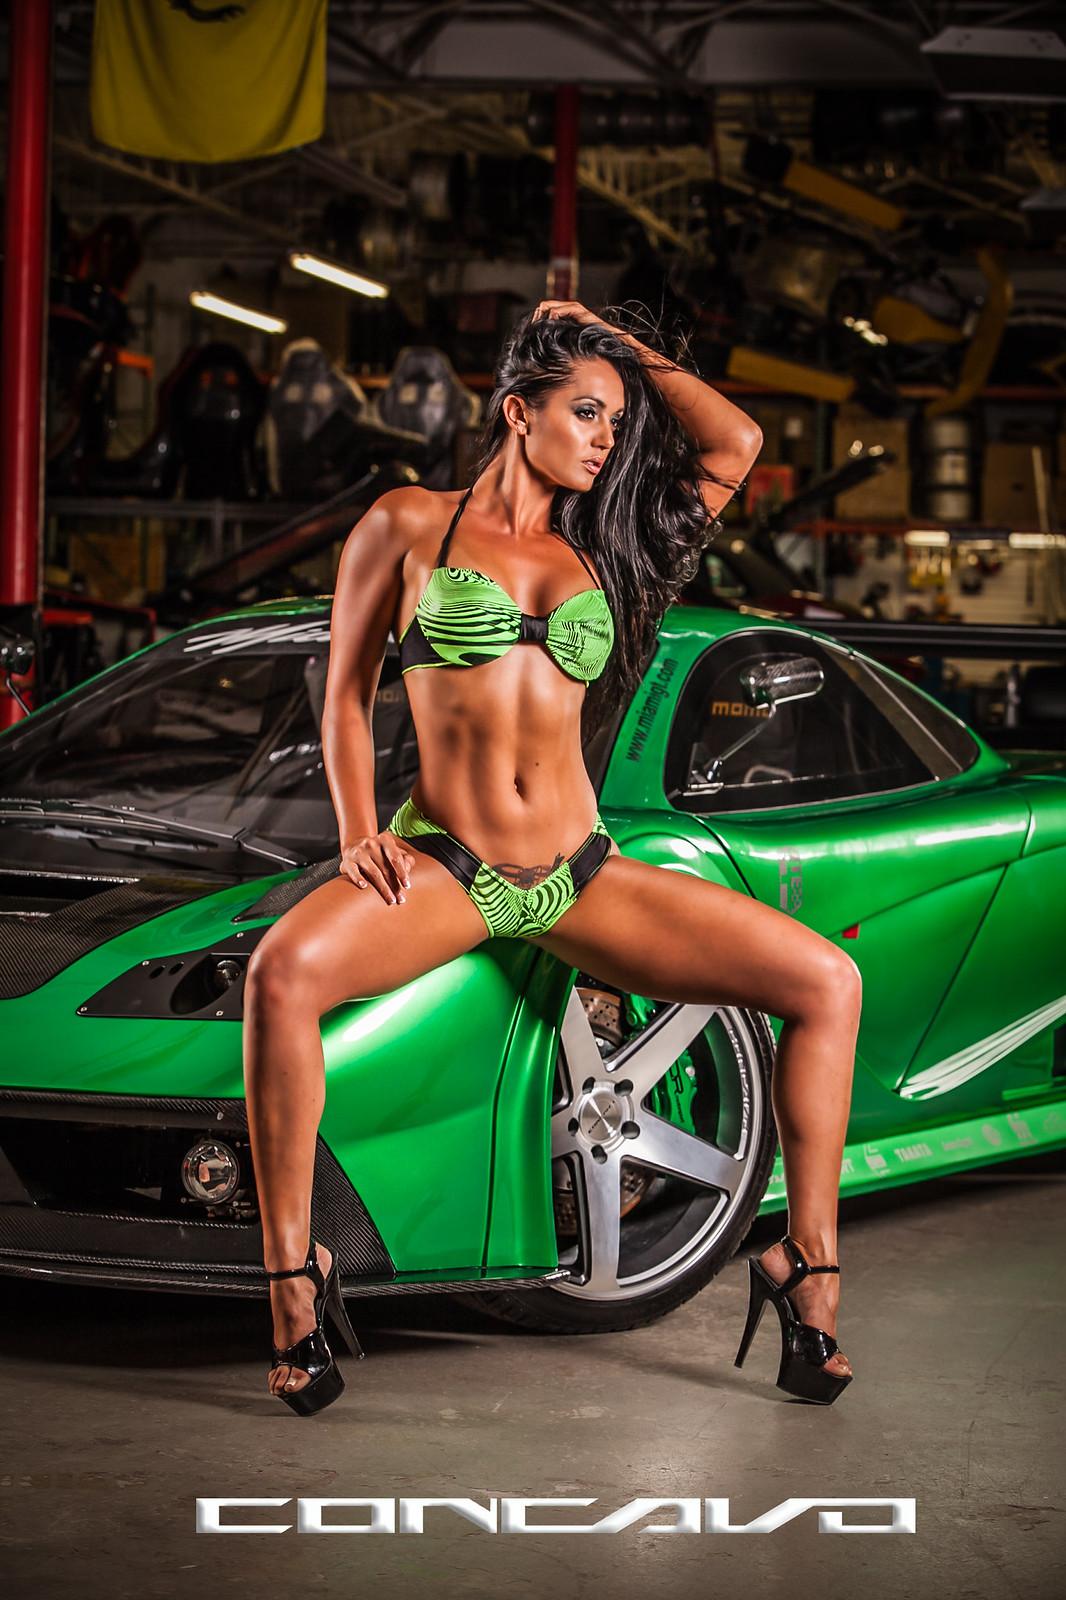 Bikini car picture wash